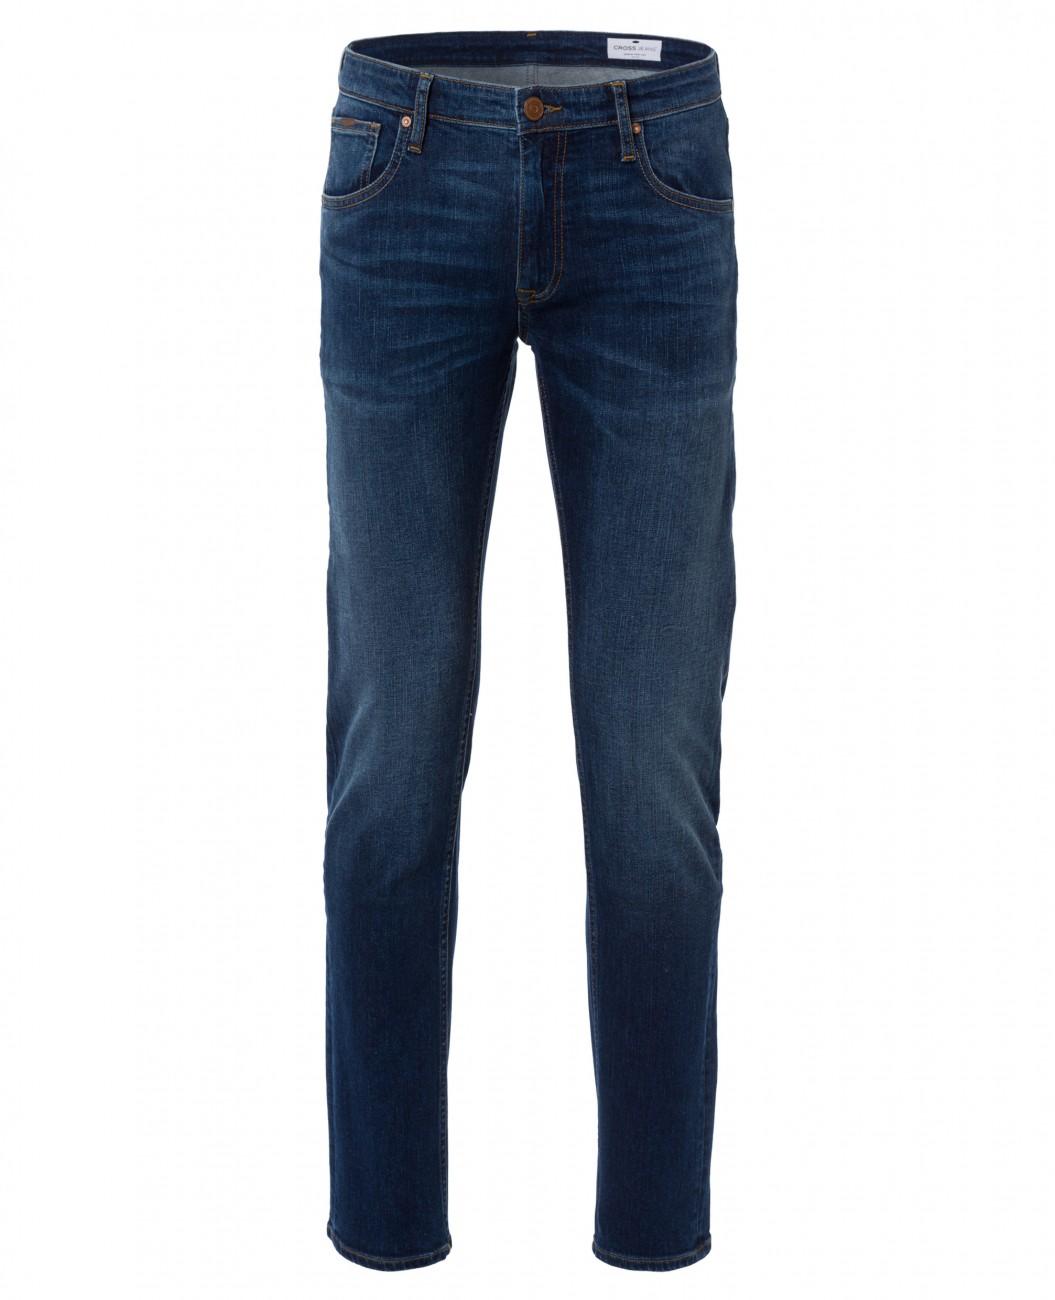 cross herren jeans damien slim fit blau stone ebay. Black Bedroom Furniture Sets. Home Design Ideas